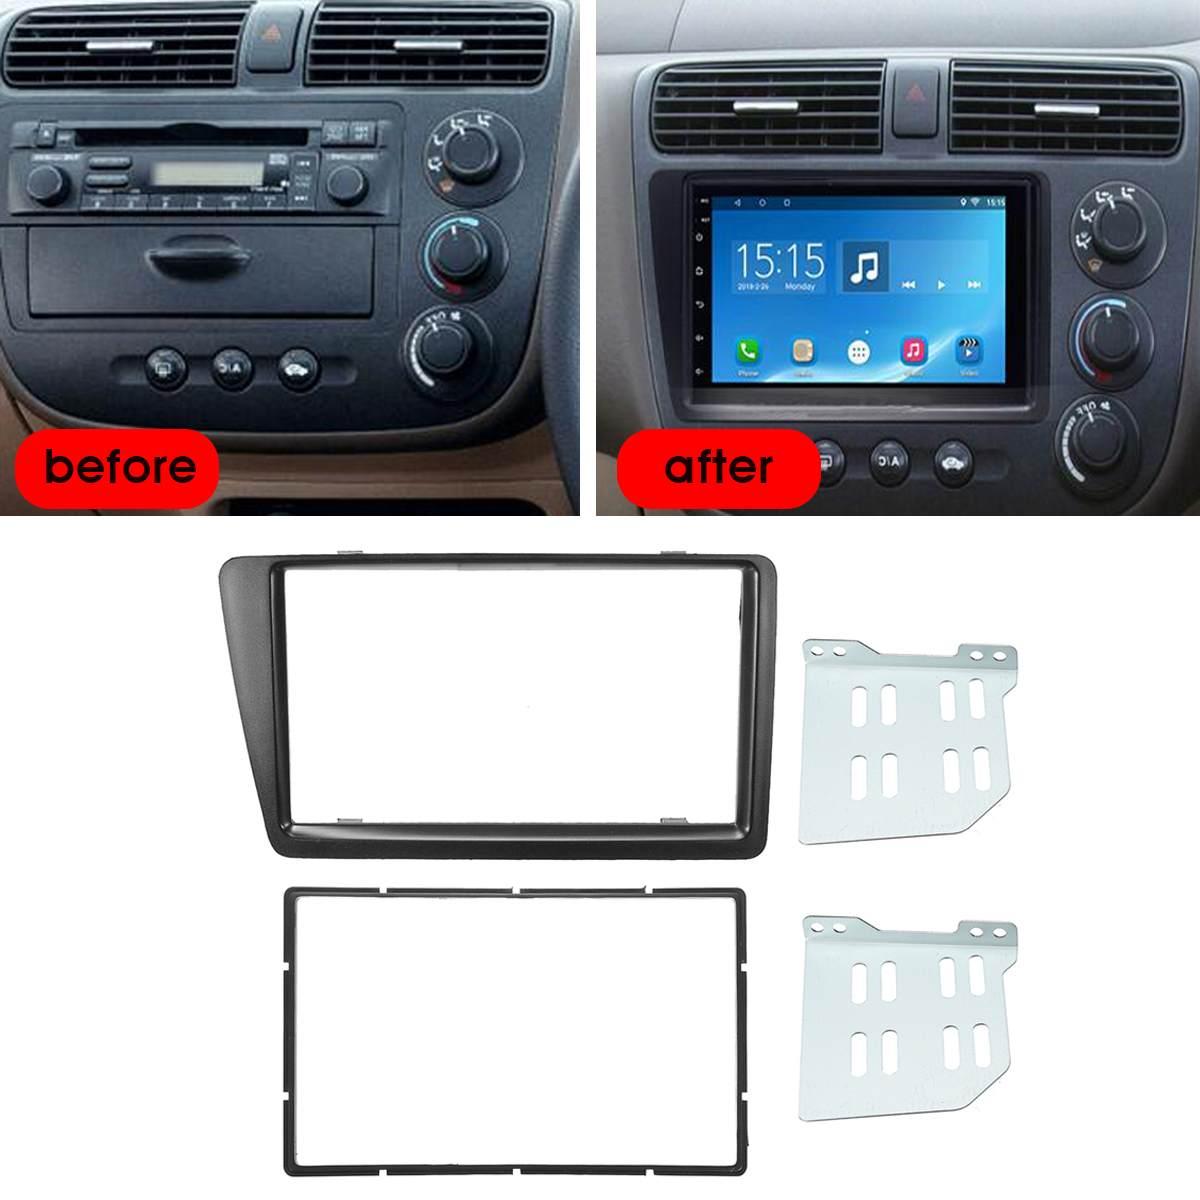 2001 2002 2003 2004 2005 Honda Civic Dash Kit Double Din Stereo Install